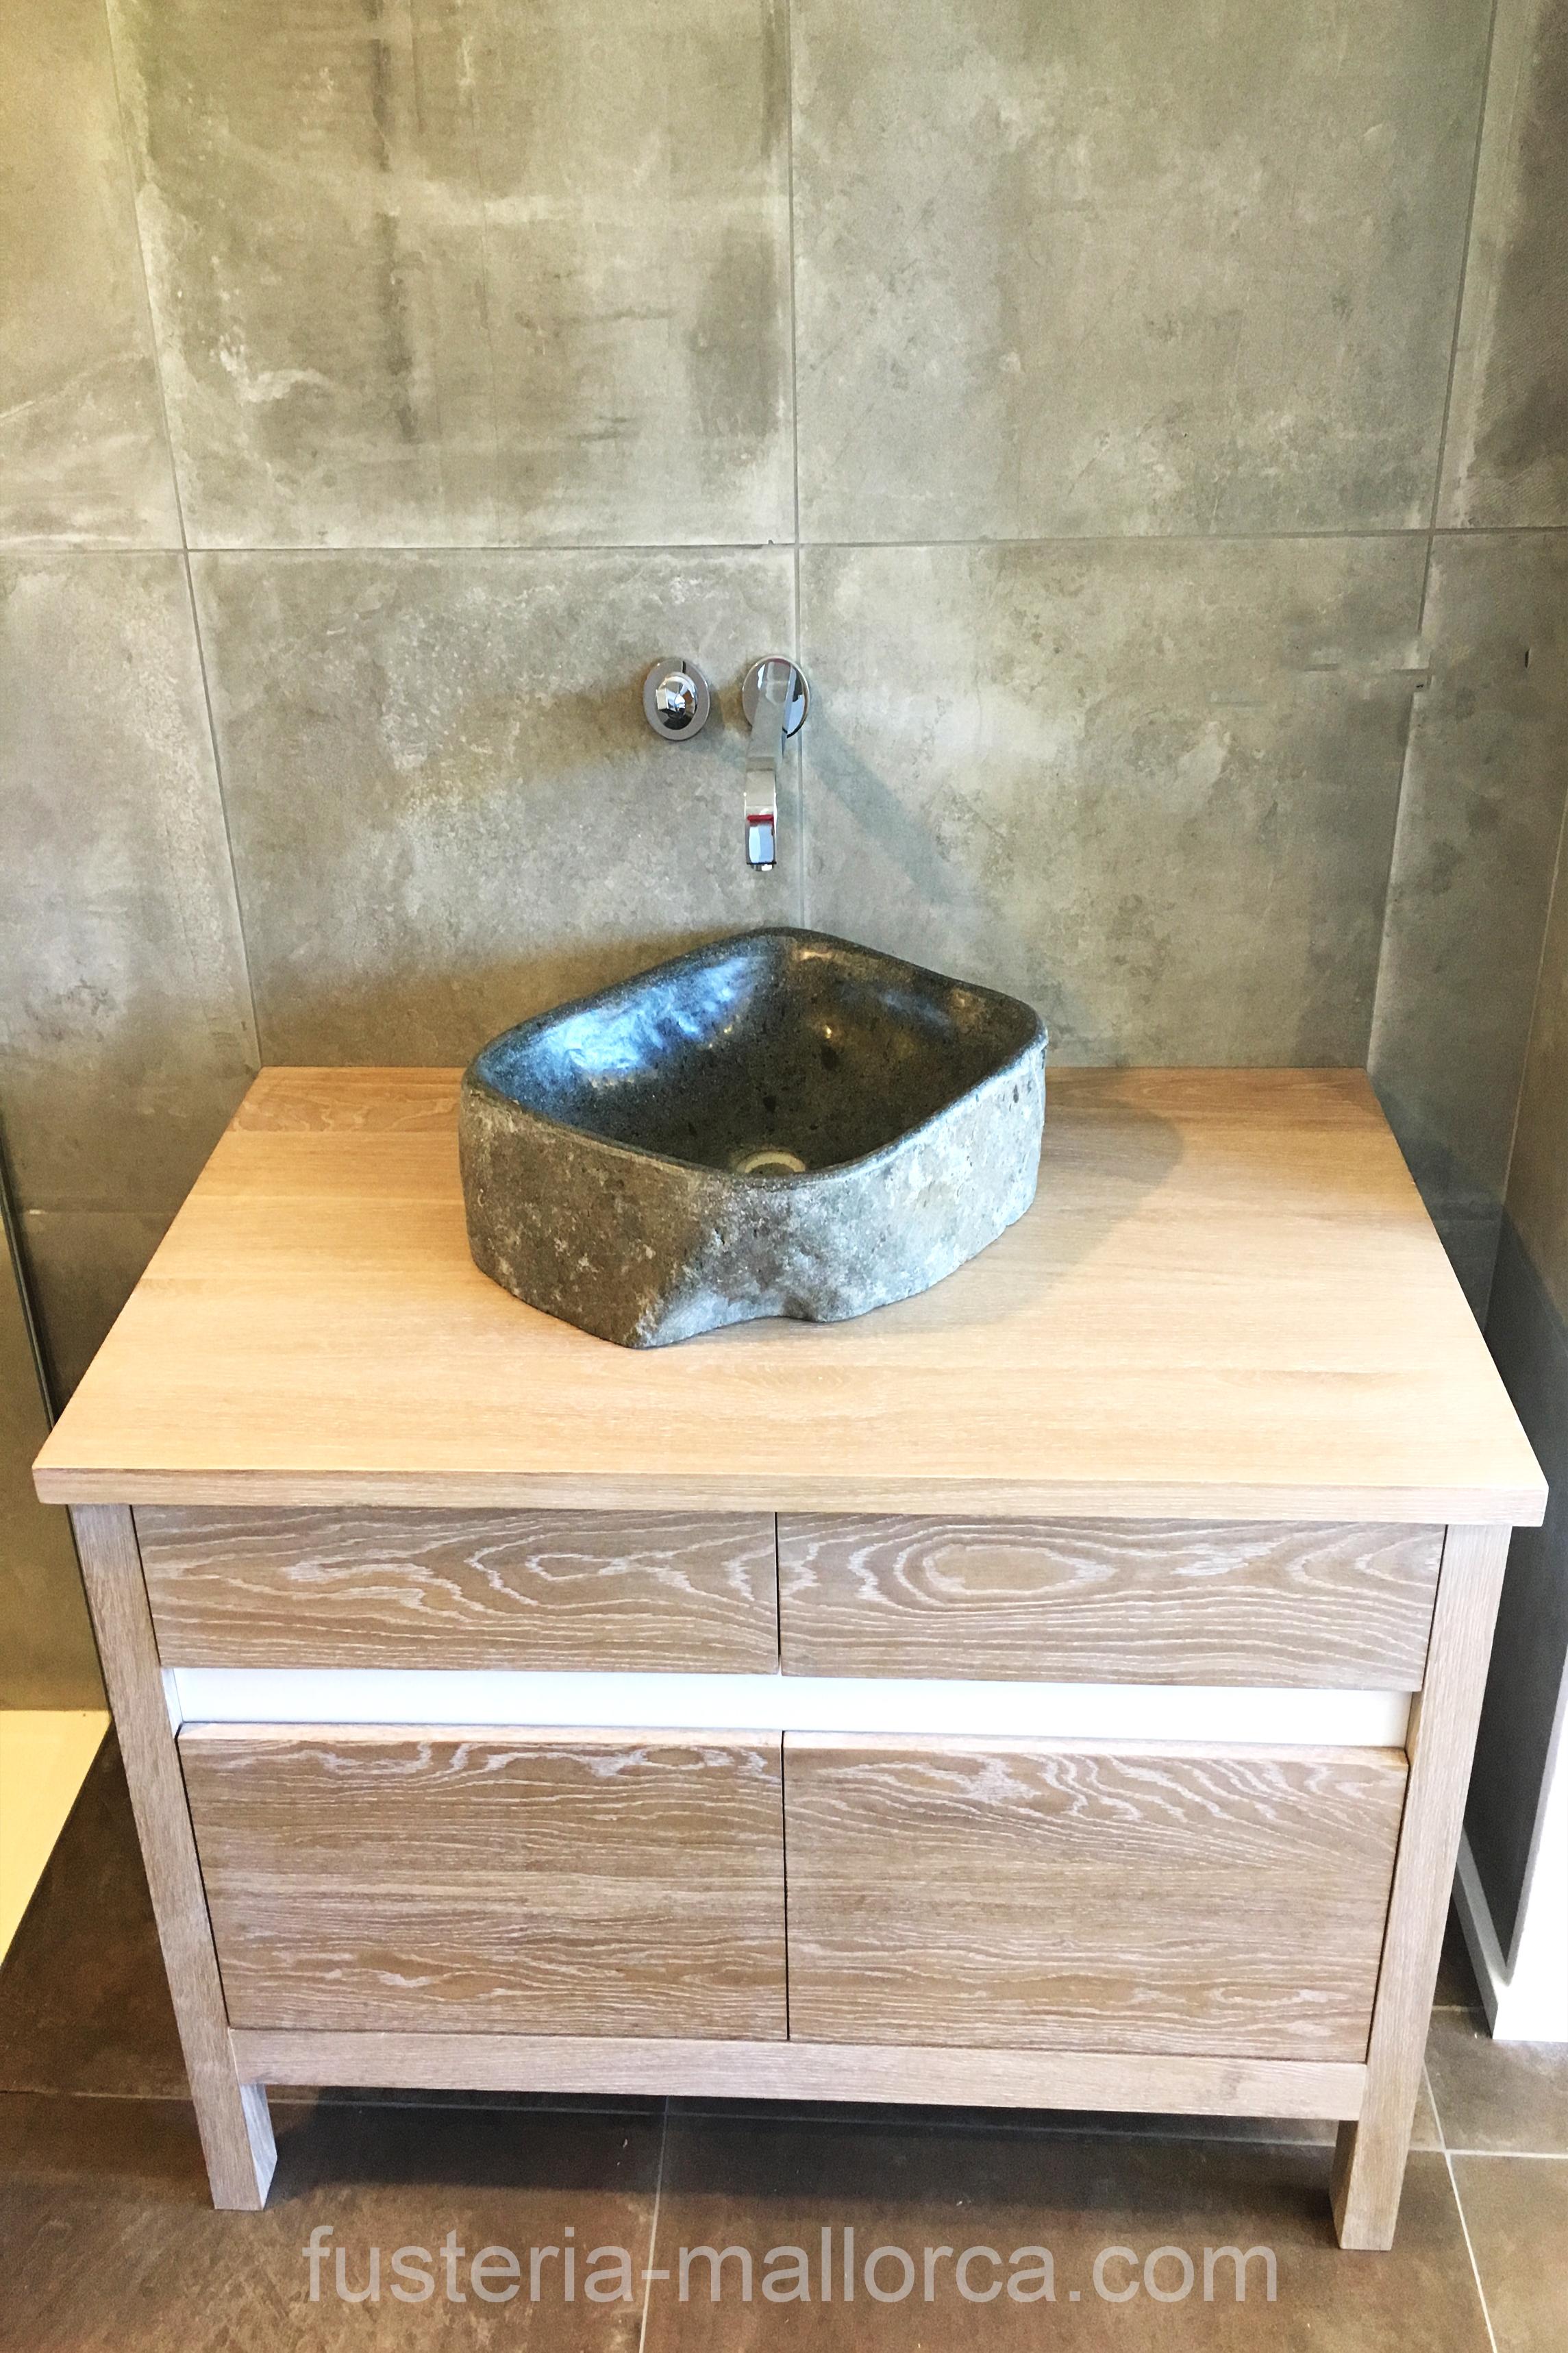 #wood #art #design #holz #kunst #design #madera #arte #bathroom #stoneandwood #badezimmer #steinundholz #aseo #maderaypiedra